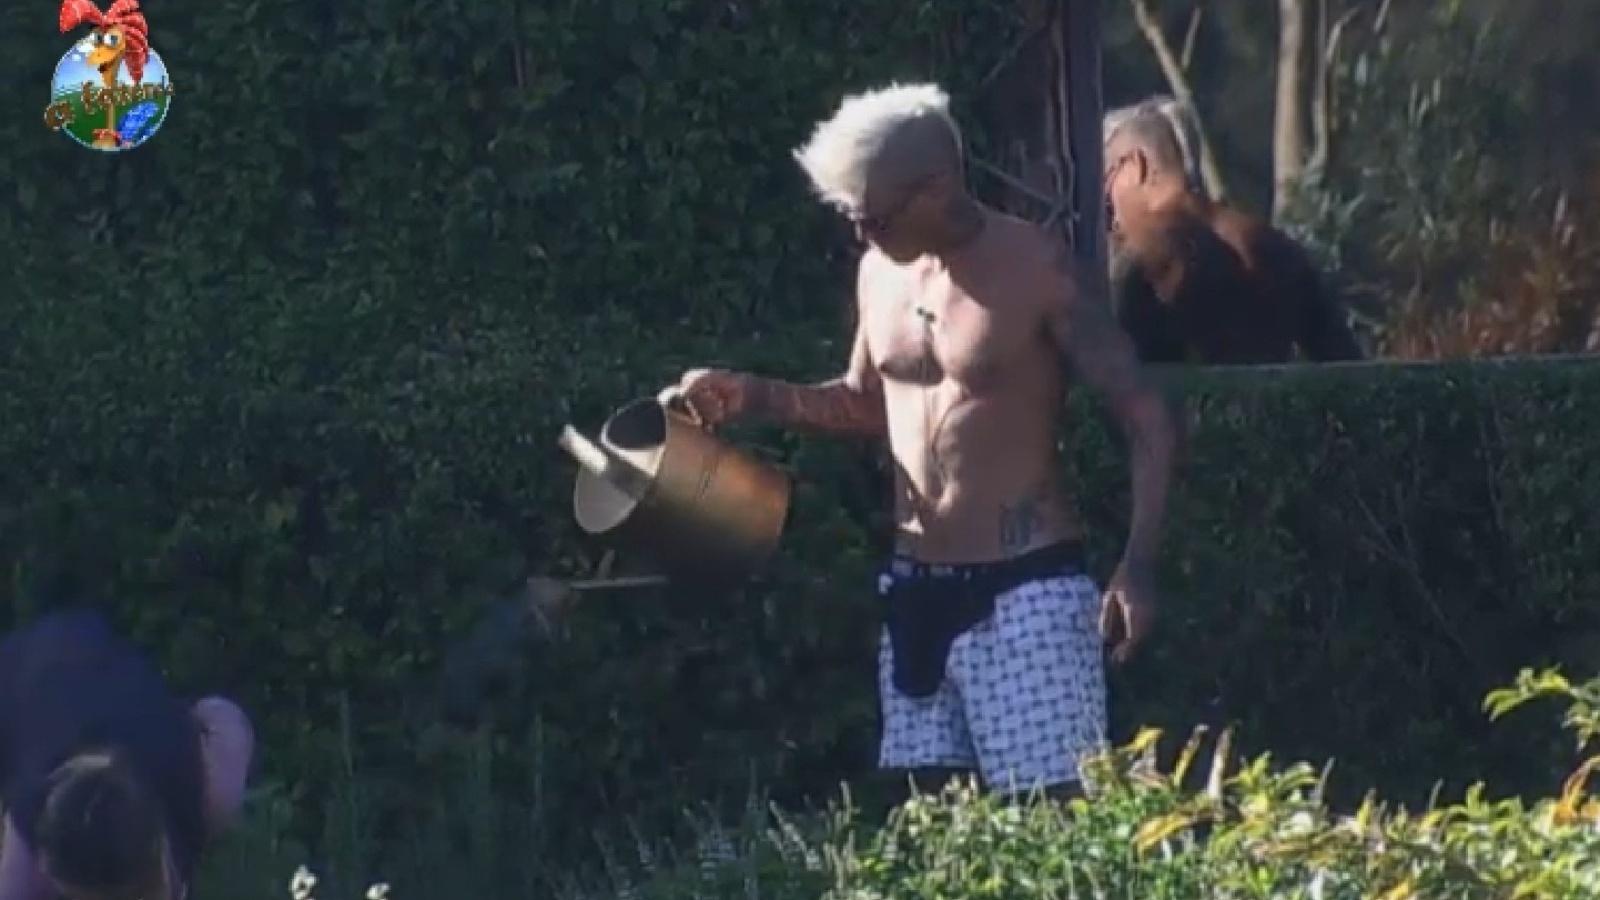 8.ago.2013 - Mateus rega a horta de cueca na manhã desta quinta-feira